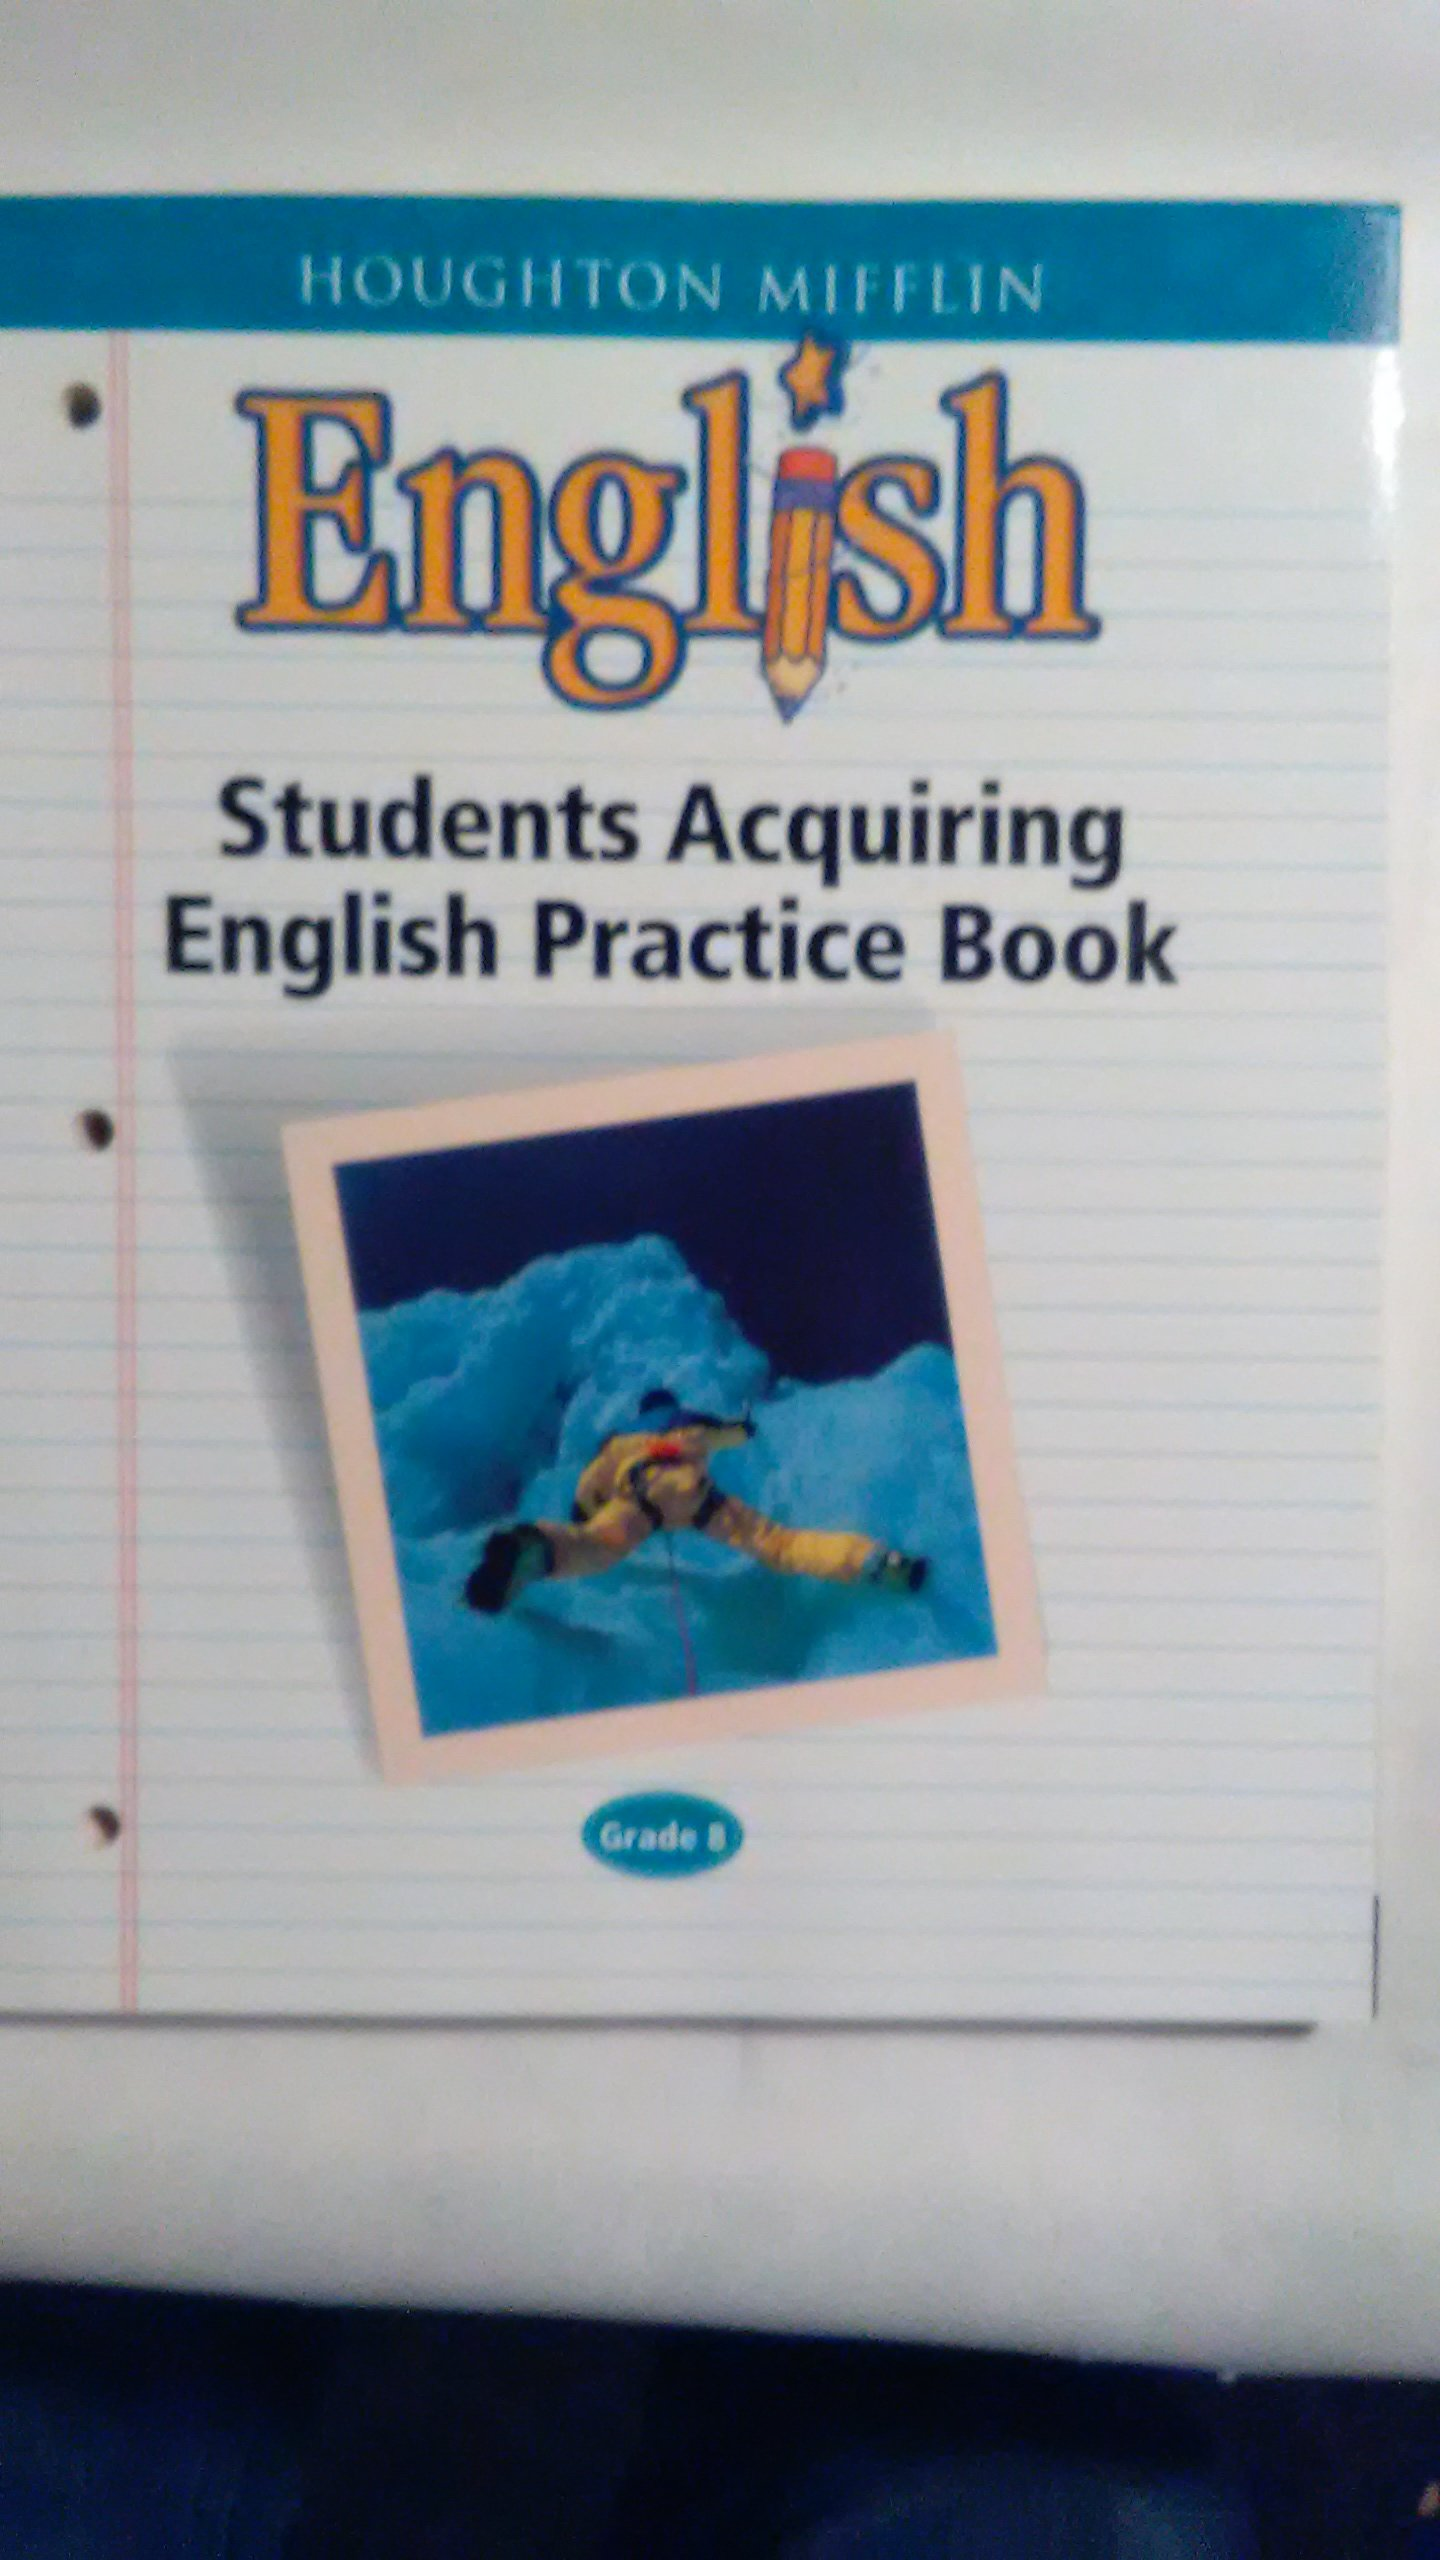 Students Acquiring English Practice Book Grade 8 (Hougton Mifflin English) pdf